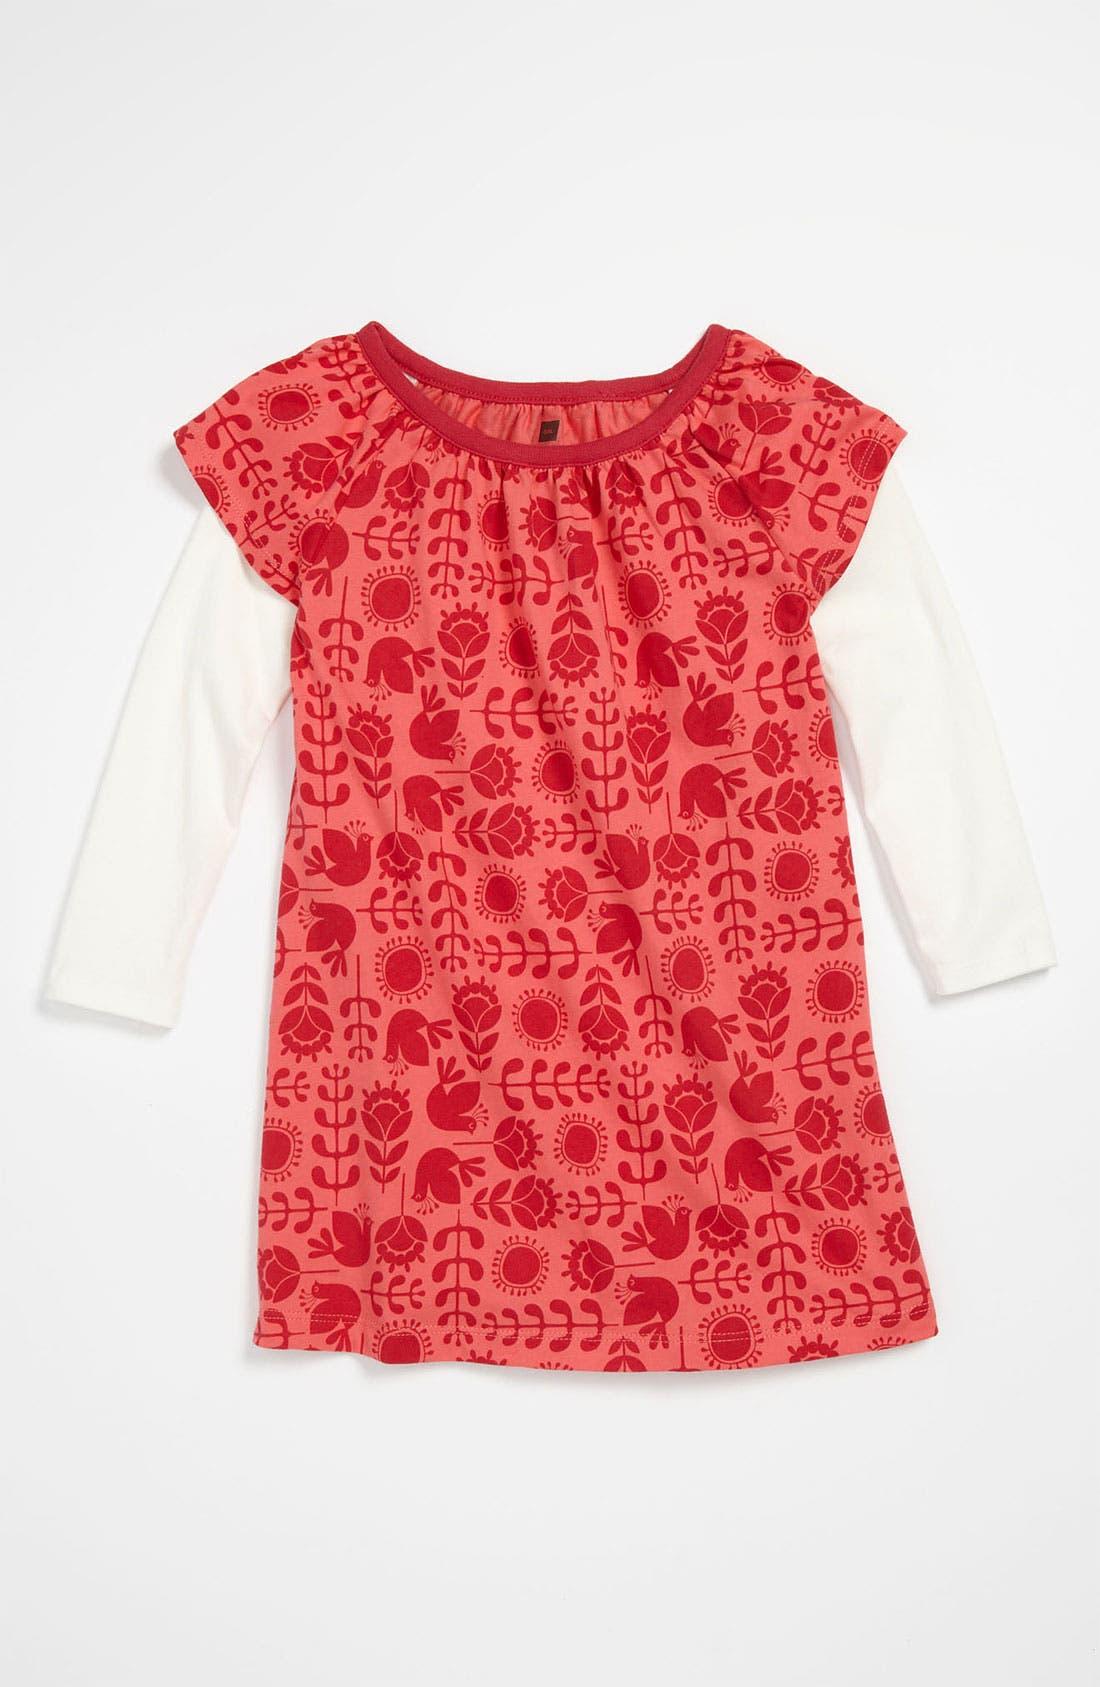 Main Image - Tea Collection 'Swedish Lark' Dress (Toddler)